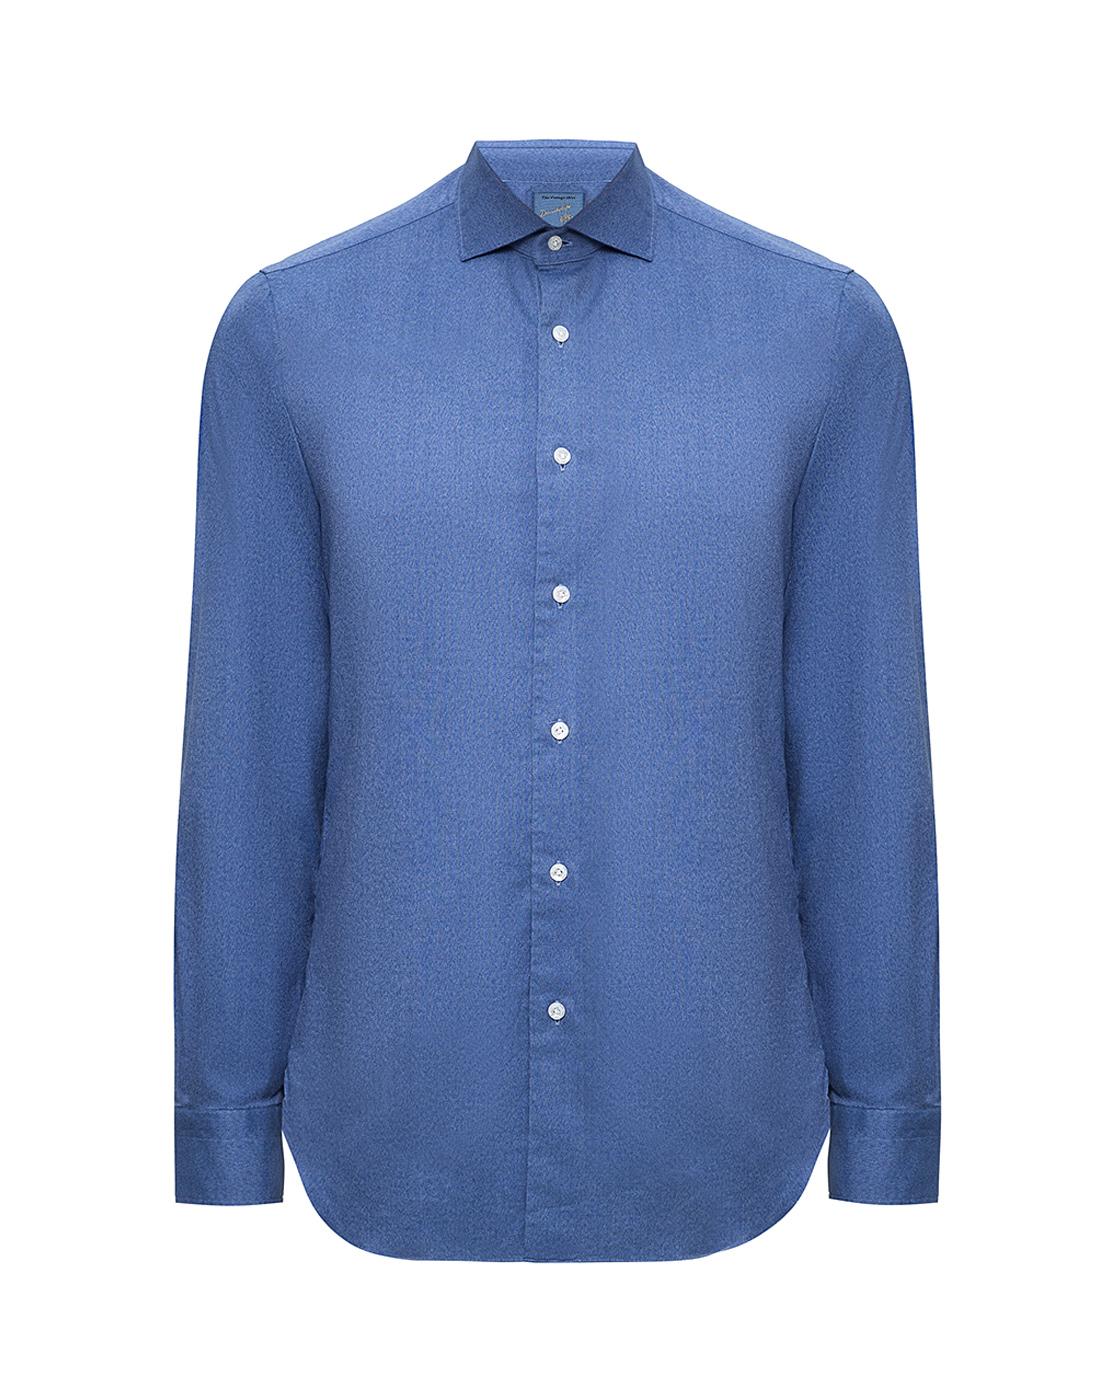 Мужская синяя рубашка Barba S554506U-1